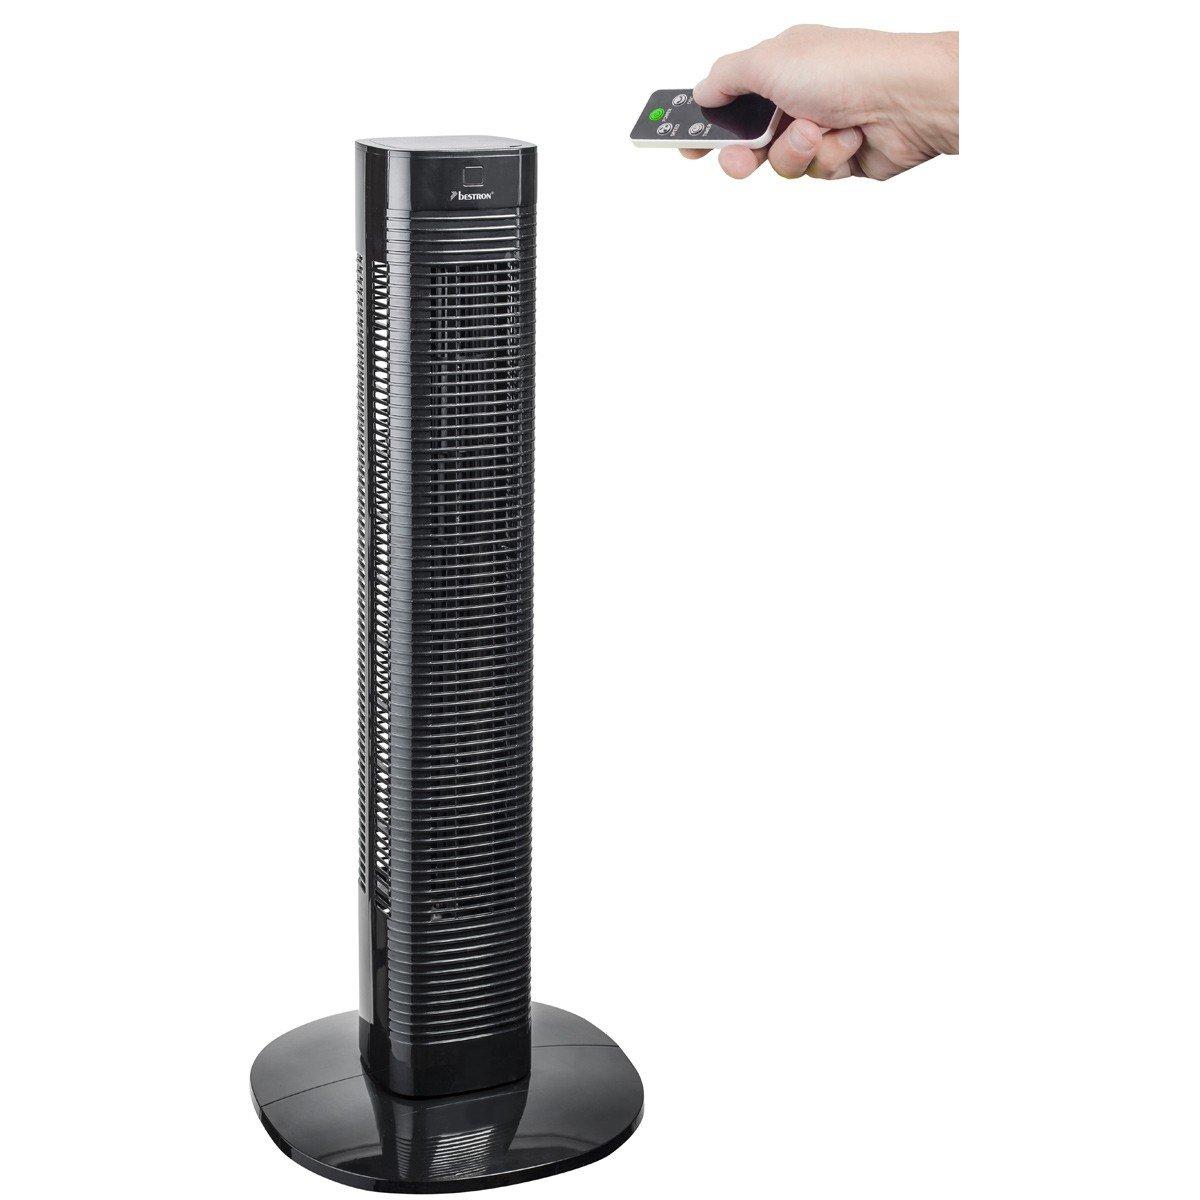 Wonderbaarlijk Bestron Compact Tower Fan With Remote Control and Digital Timer EA-22